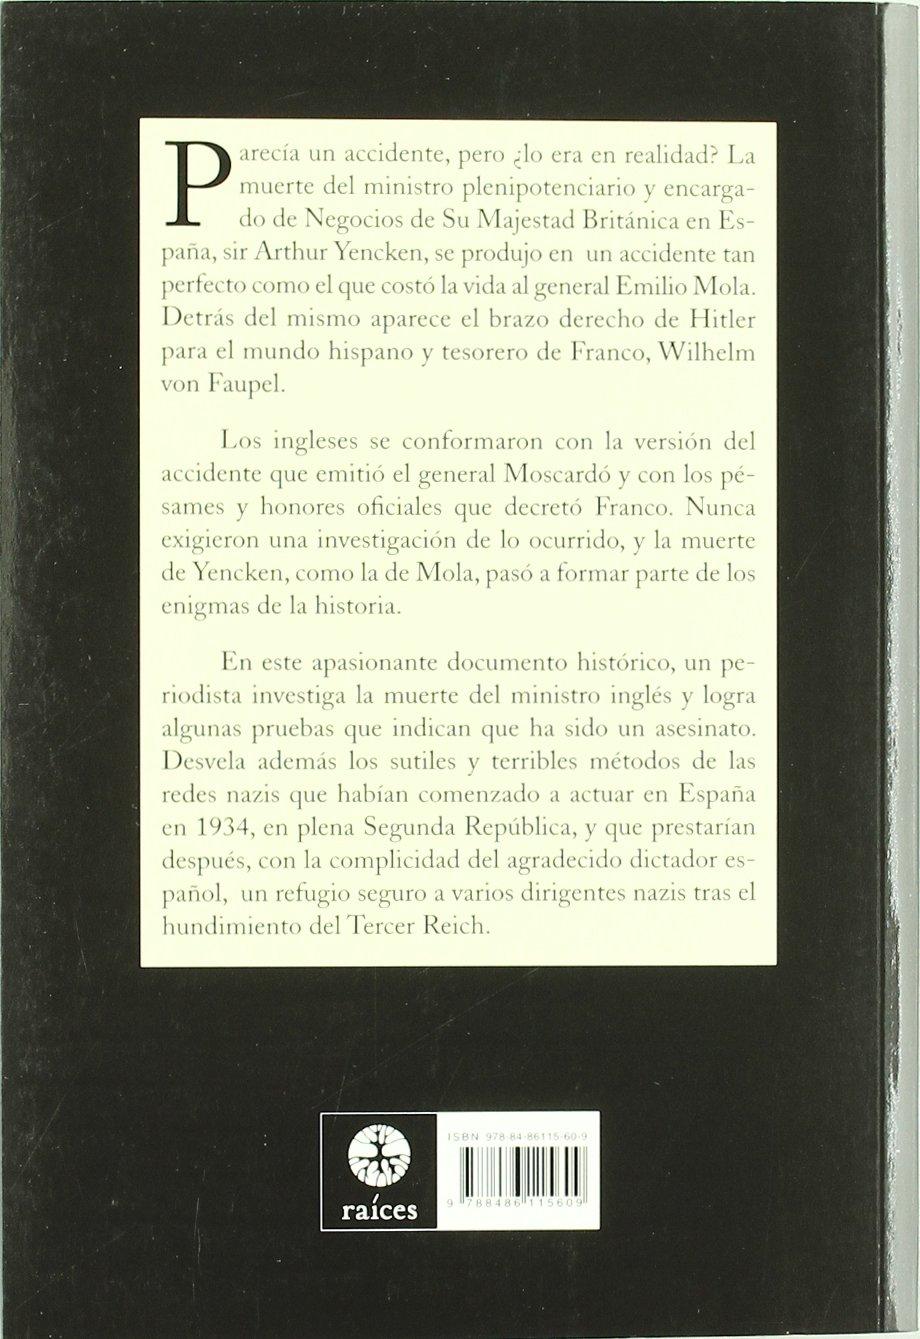 Caso Yencken: Amazon.es: Diez, Luis: Libros